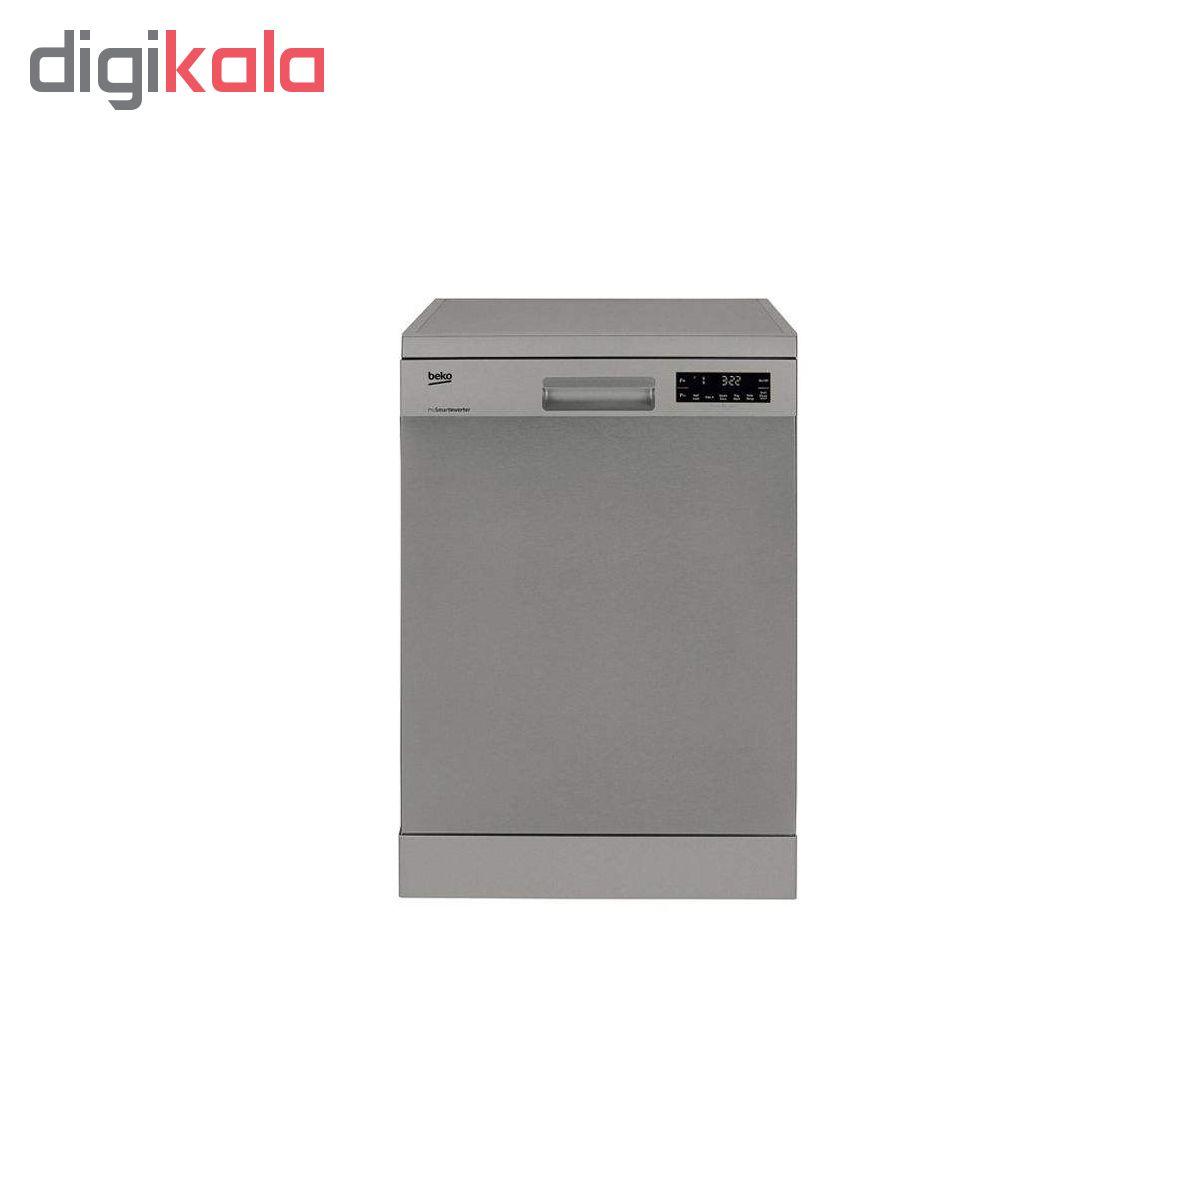 ماشین ظرفشویی بکو مدل DFN28420